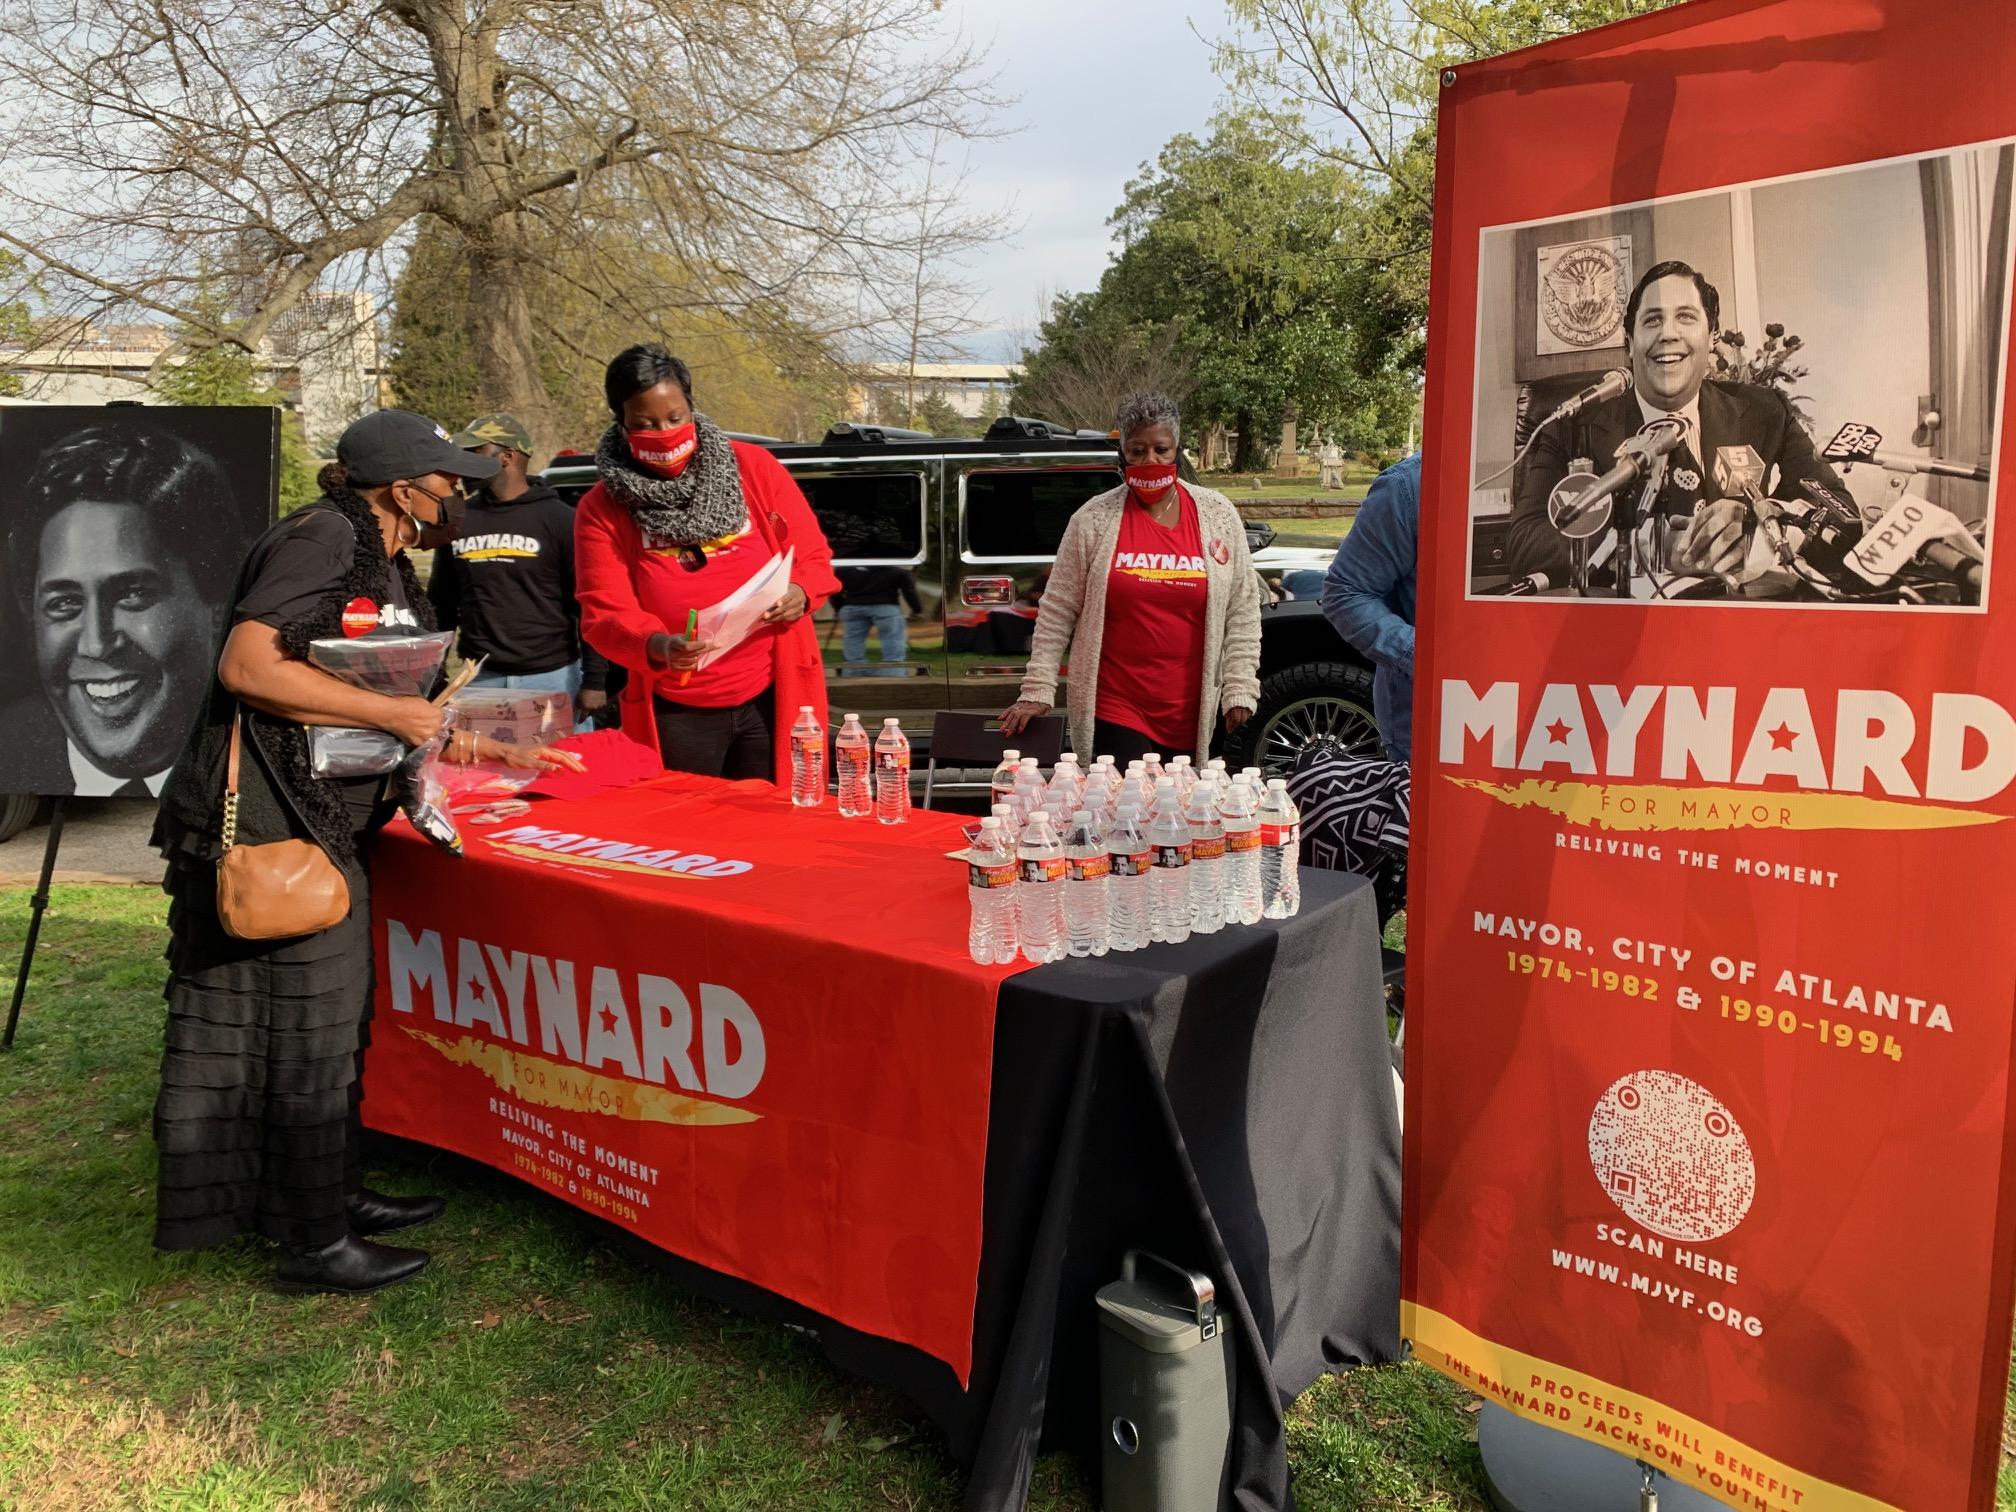 MaynardJackson2021_04